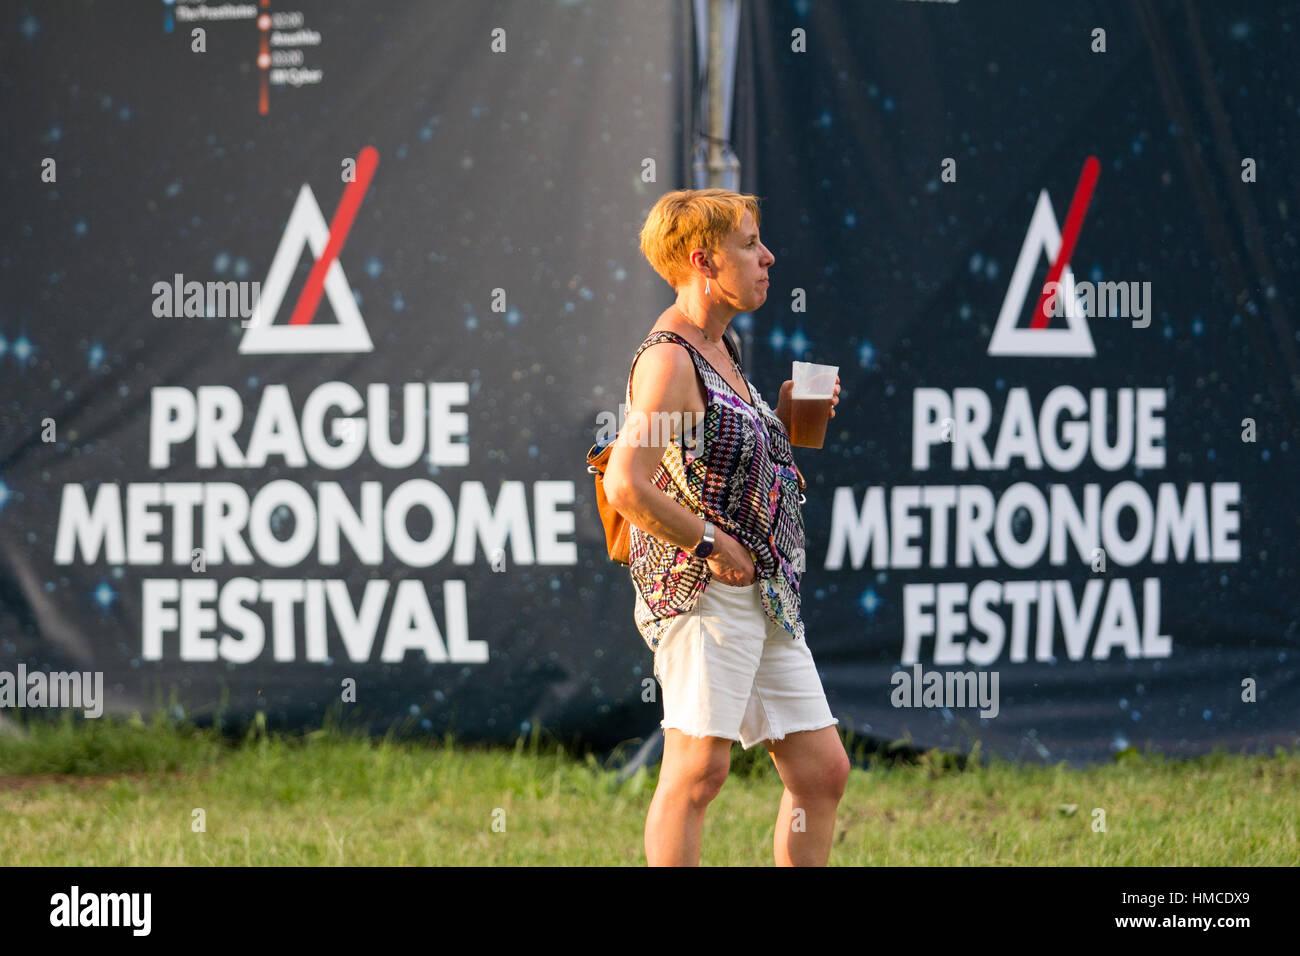 PRAGUE, CZECH REPUBLIC - JUNE 25, 2016: Festival goers at the Metronome Festival on June 25, 2016 in Prague, Czech - Stock Image